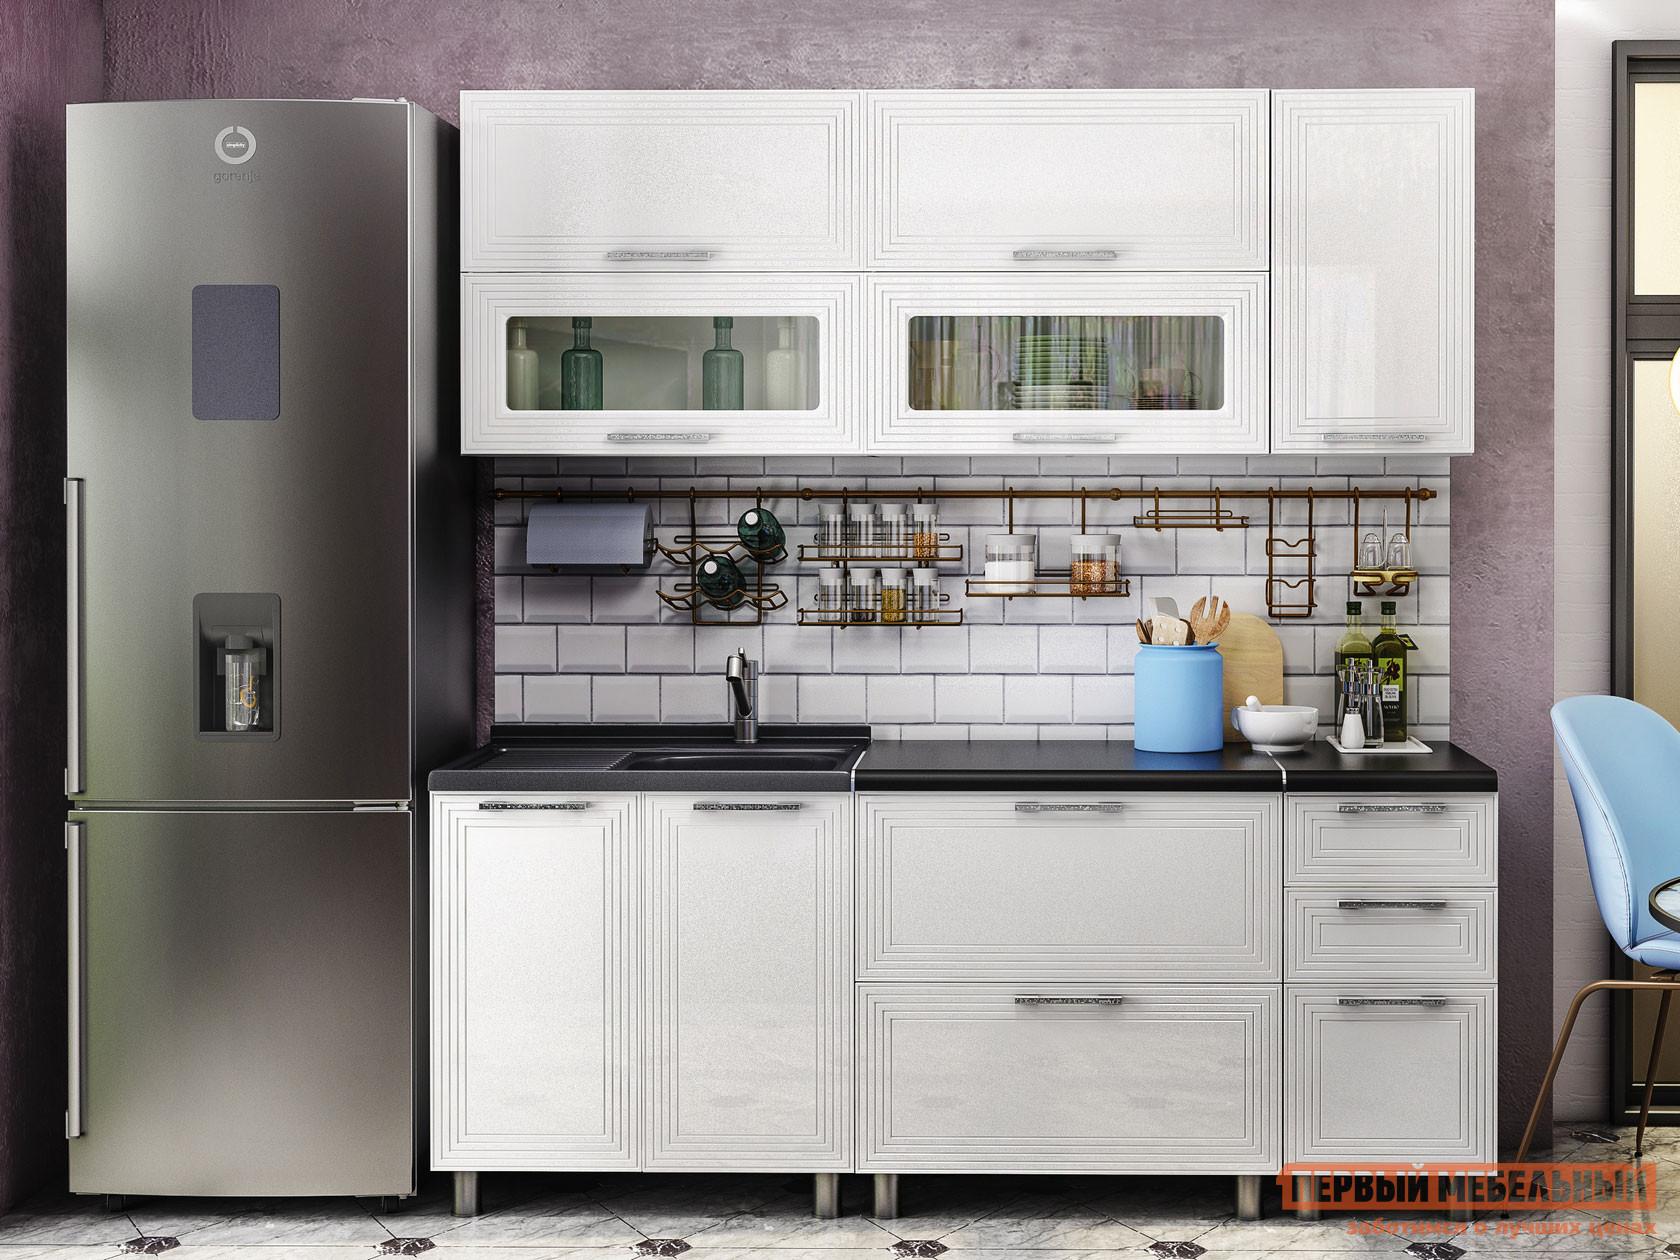 Кухонный гарнитур Первый Мебельный Монро